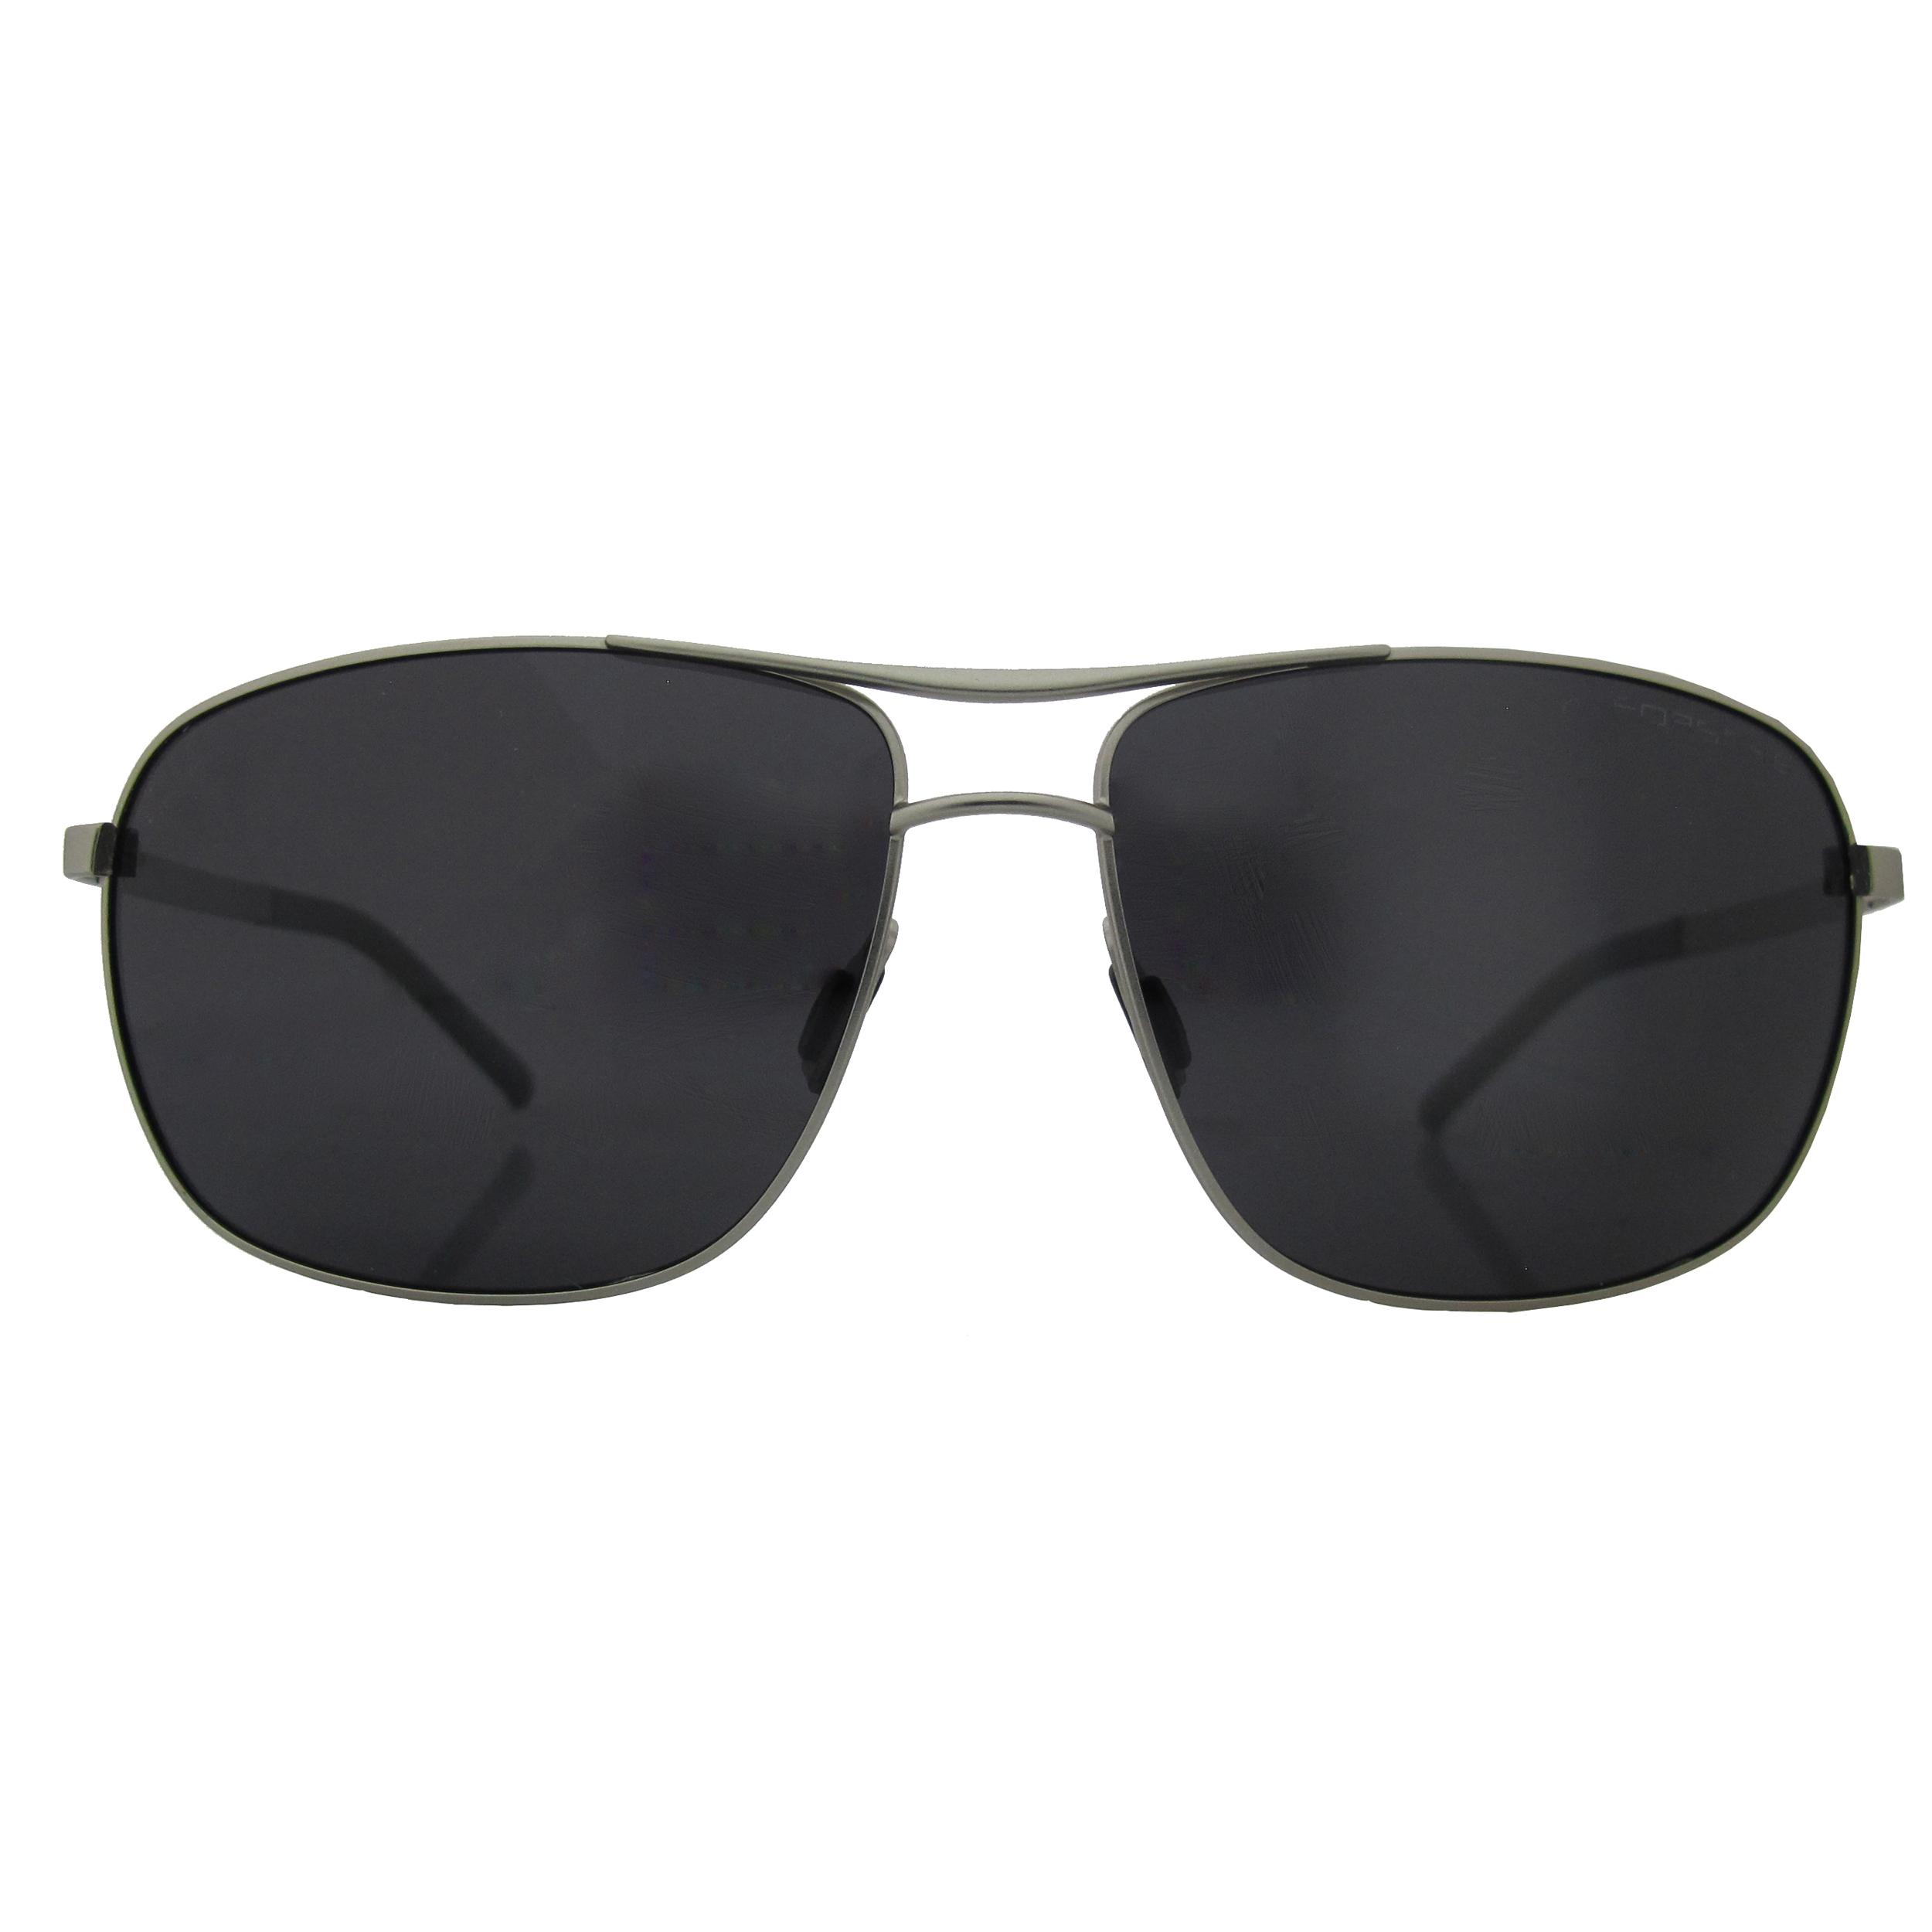 عینک آفتابی پورش دیزاین مدل P8901N -  - 2